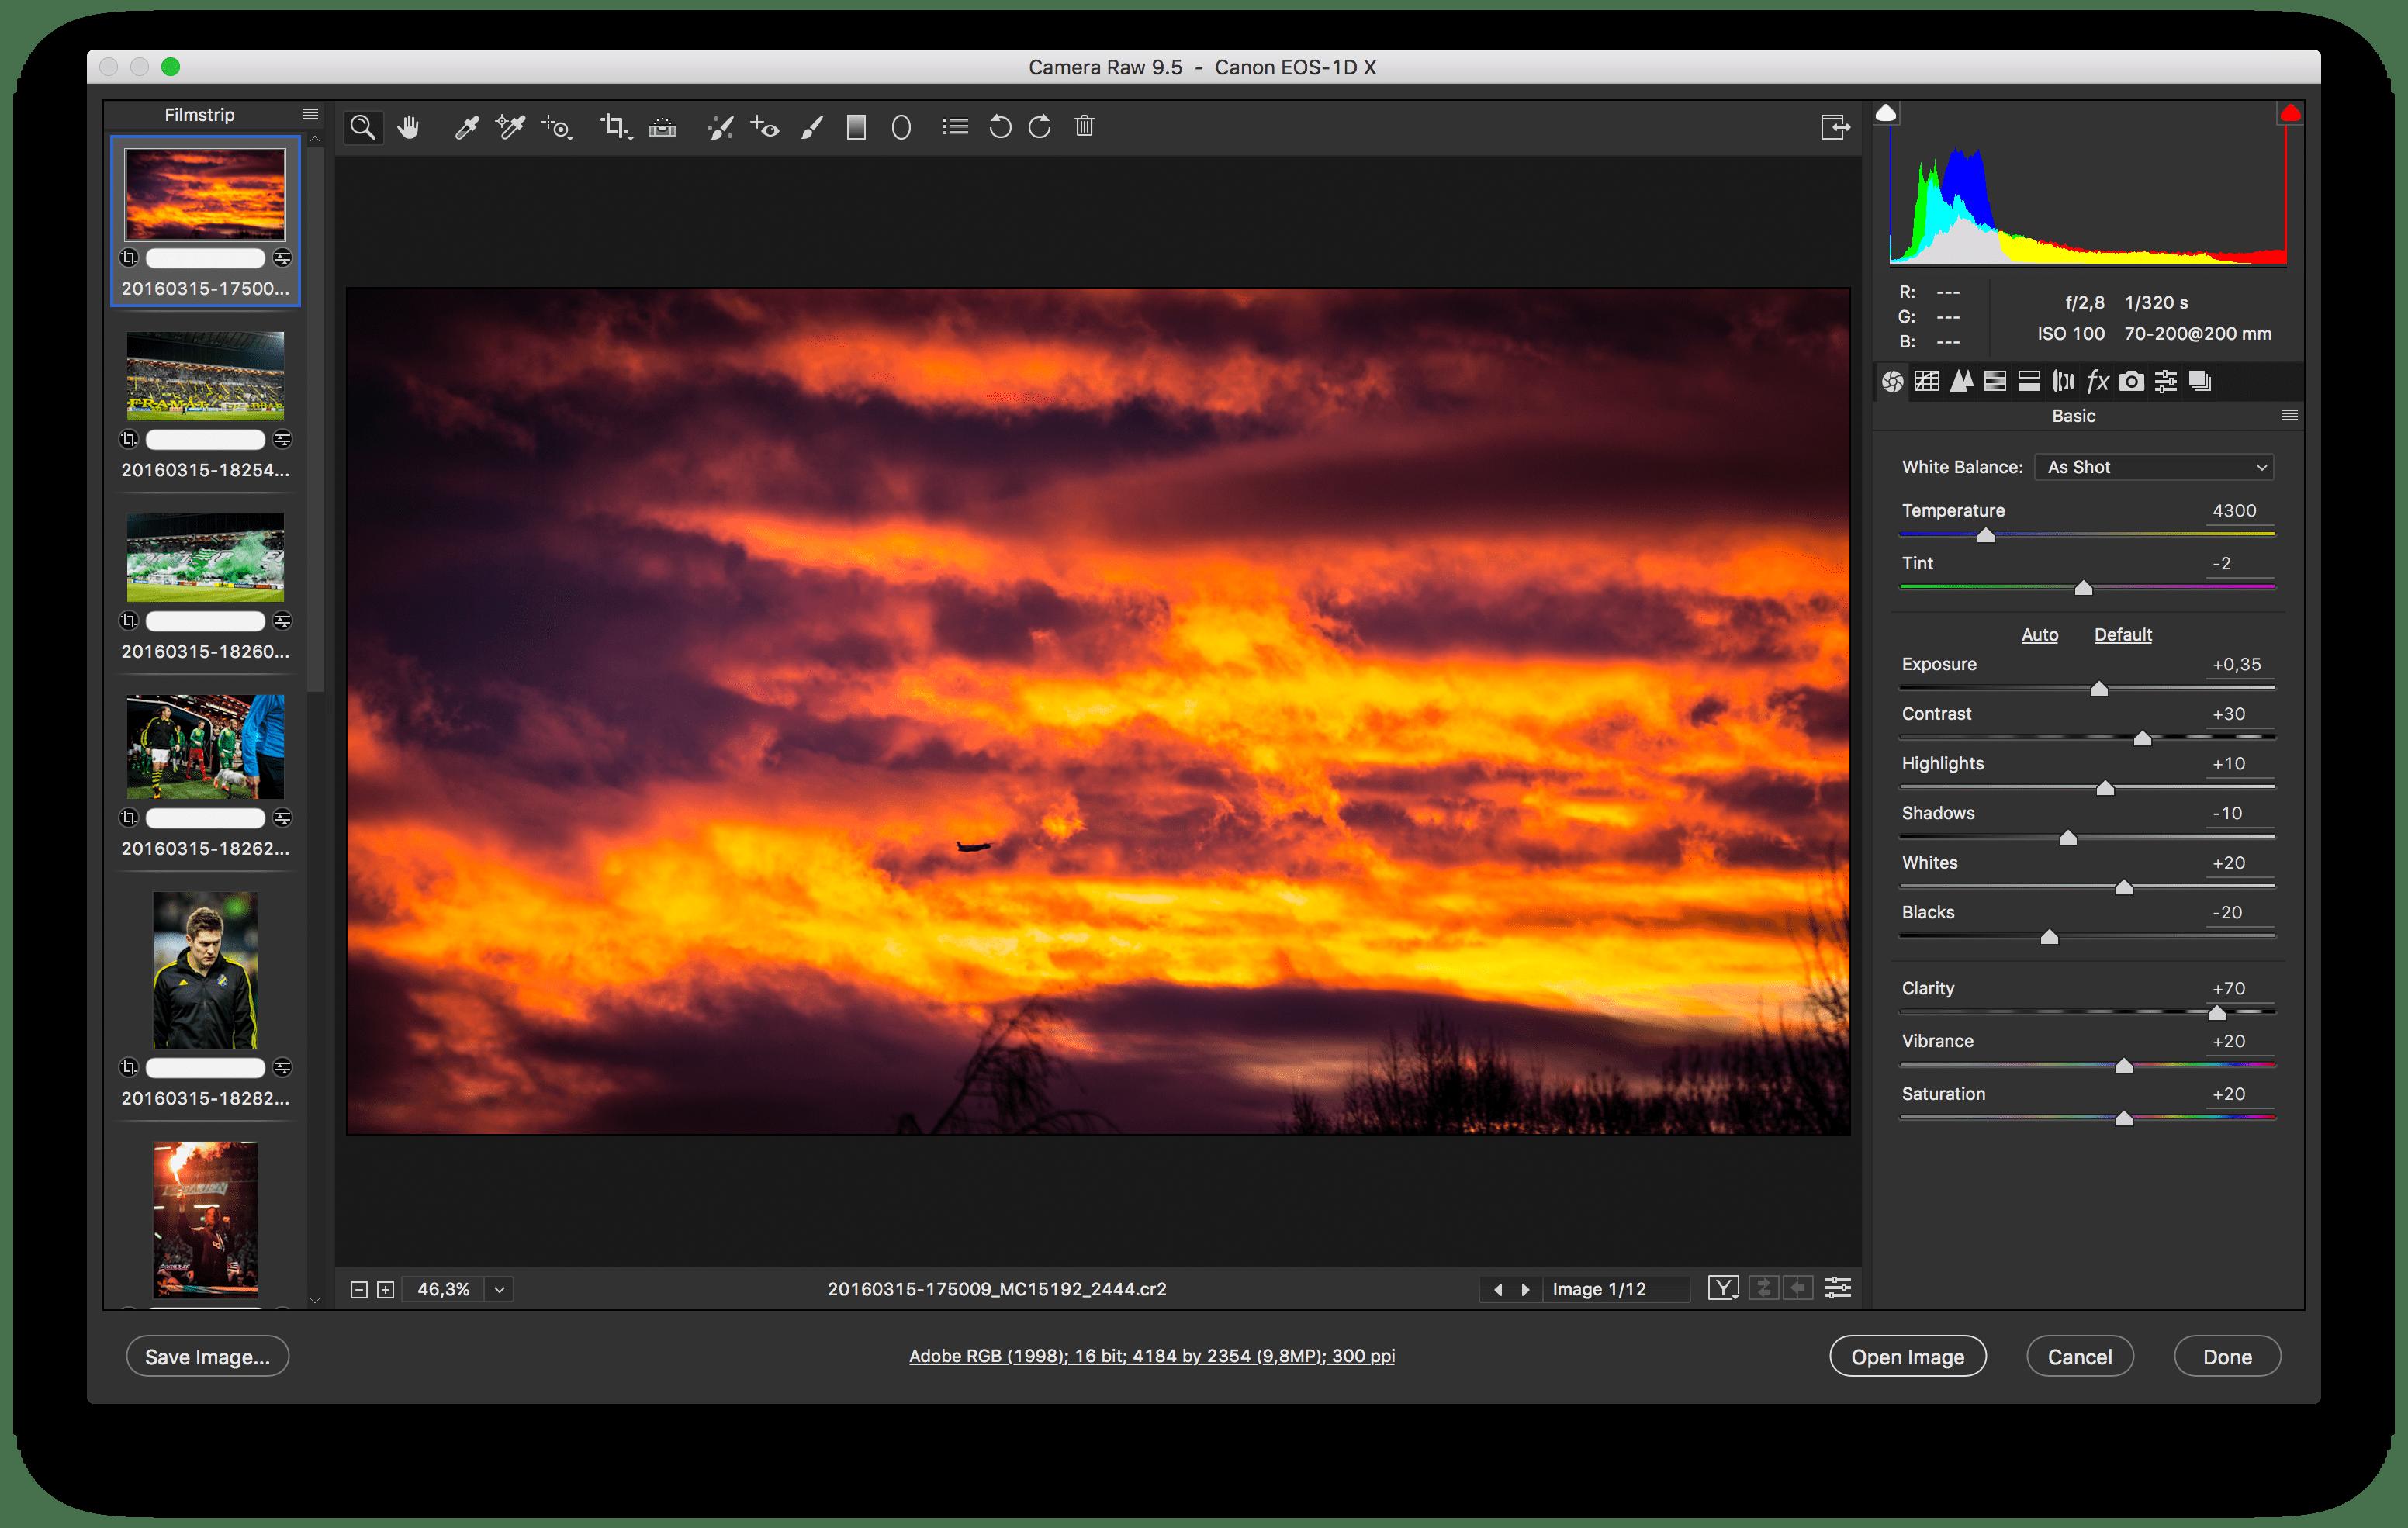 New Ui For Adobe Camera Raw